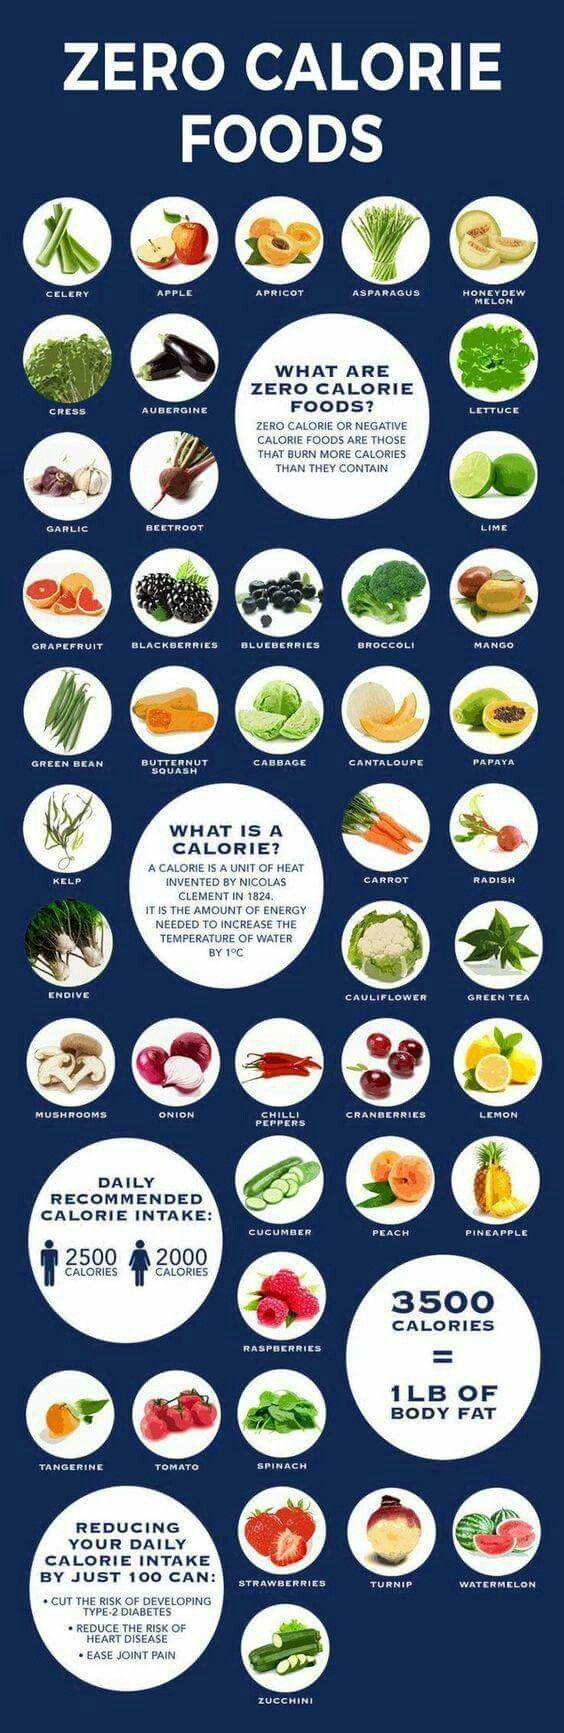 Best natural weight loss supplements 2016